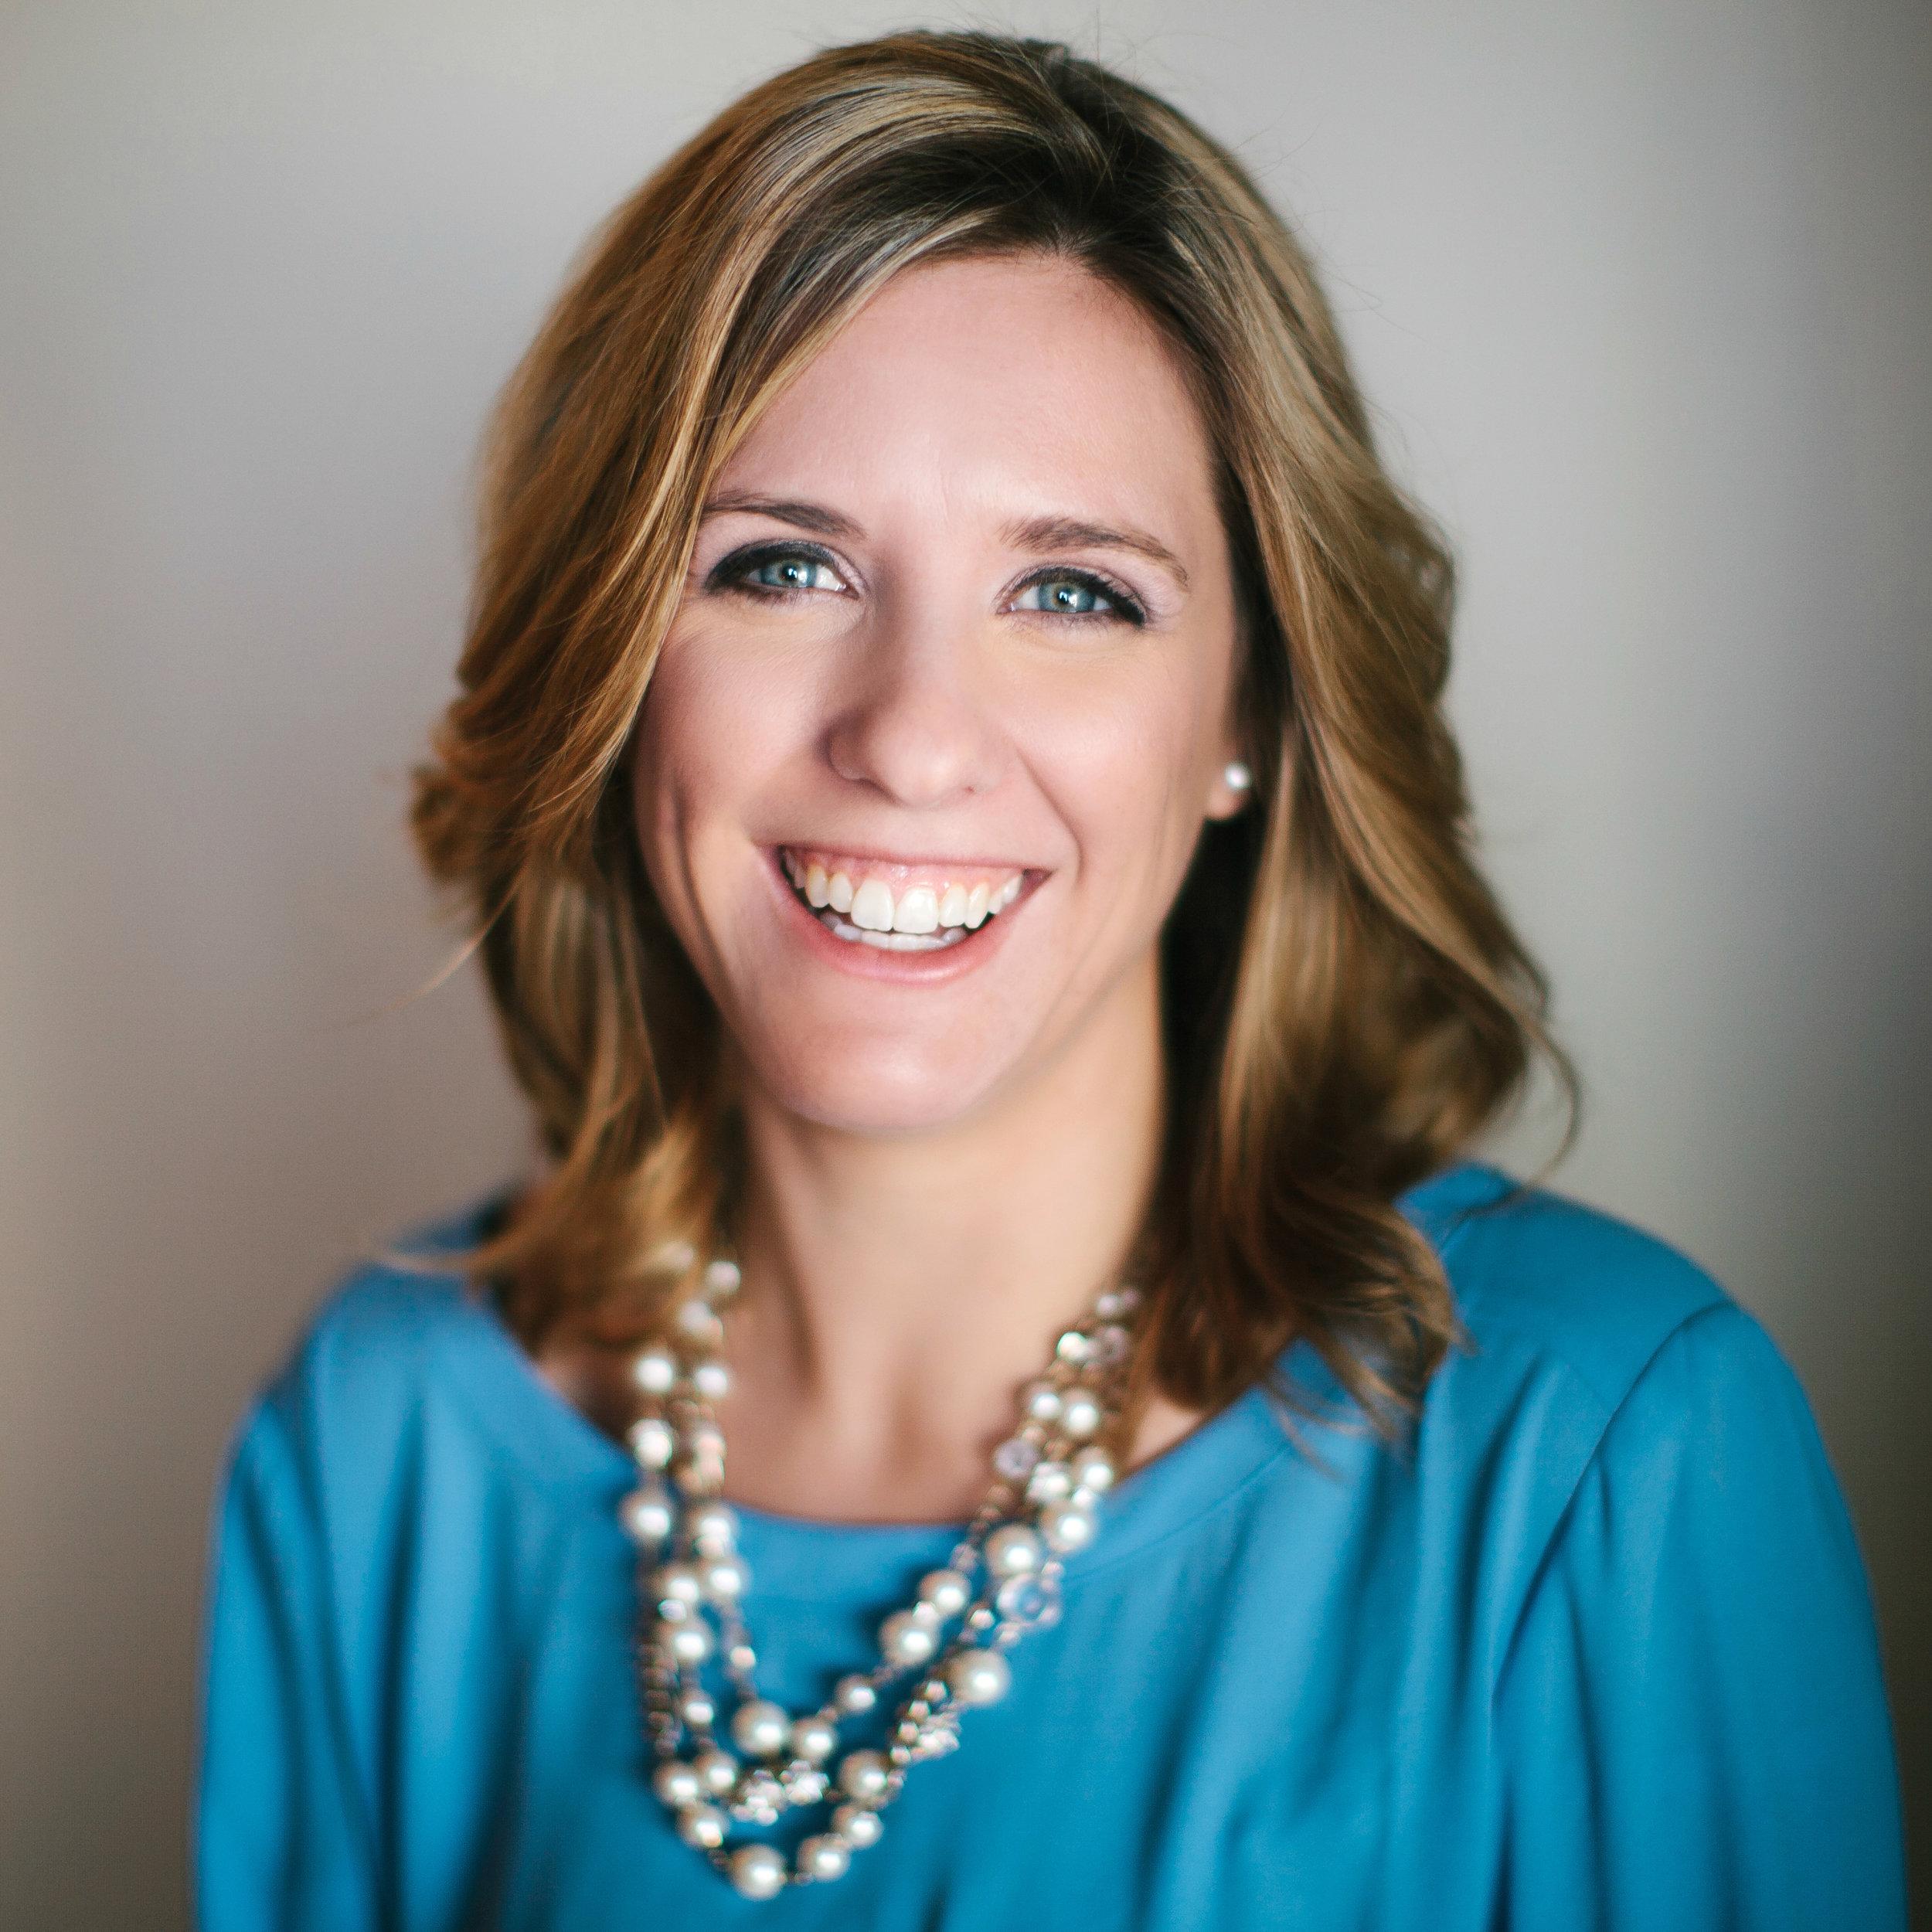 PR, Advertising and Marketing - Lauren Reed - Headshot.jpg